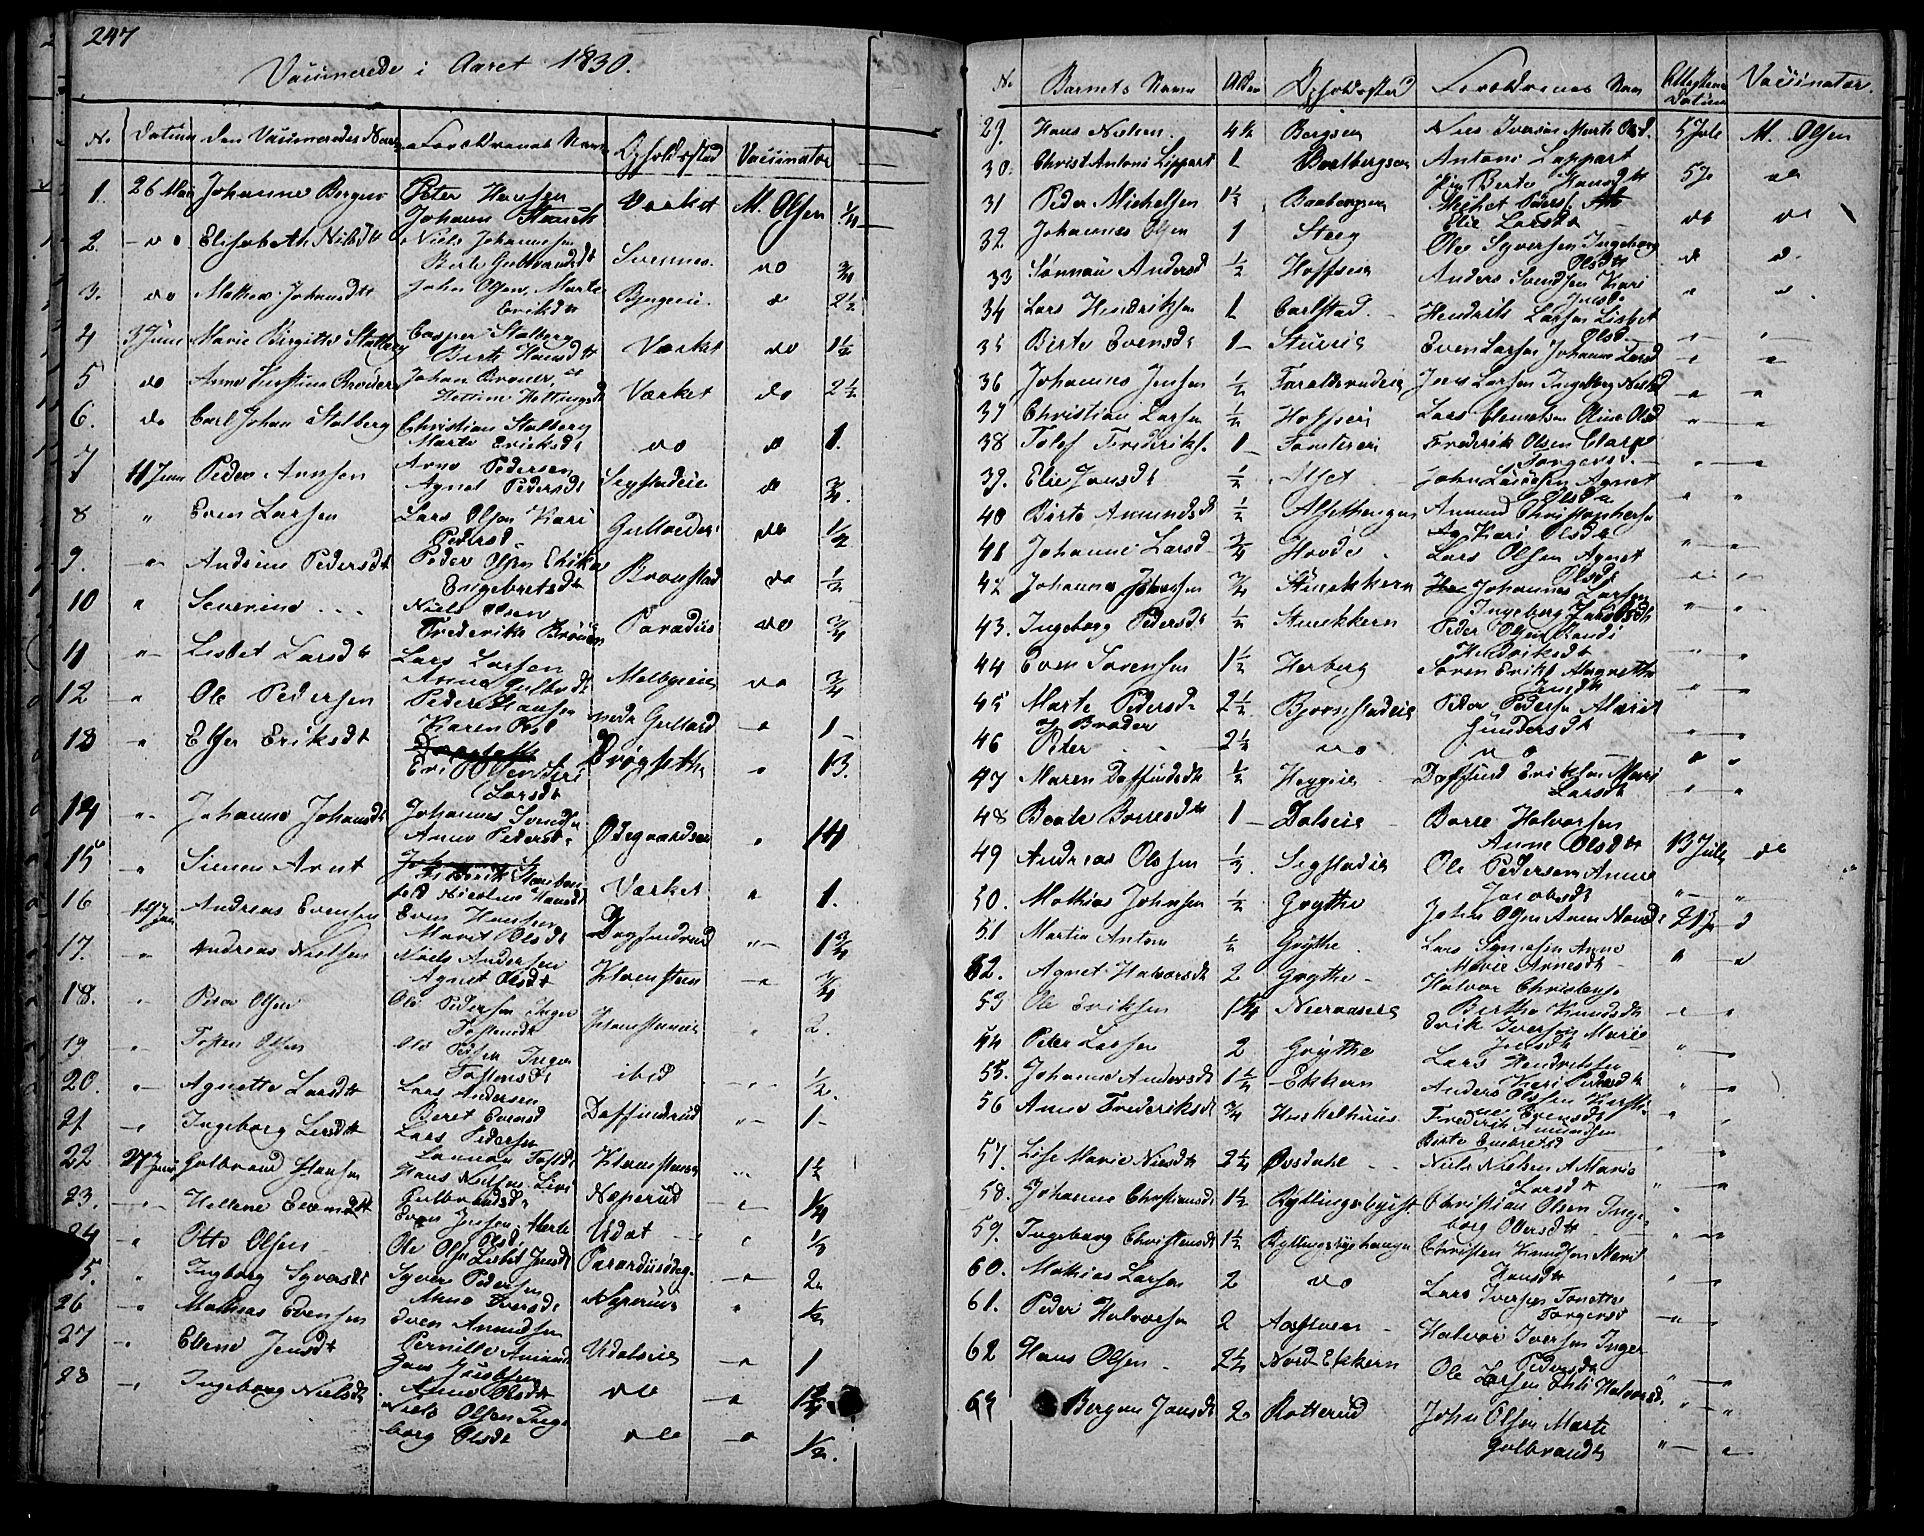 SAH, Biri prestekontor, Ministerialbok nr. 4, 1829-1842, s. 247